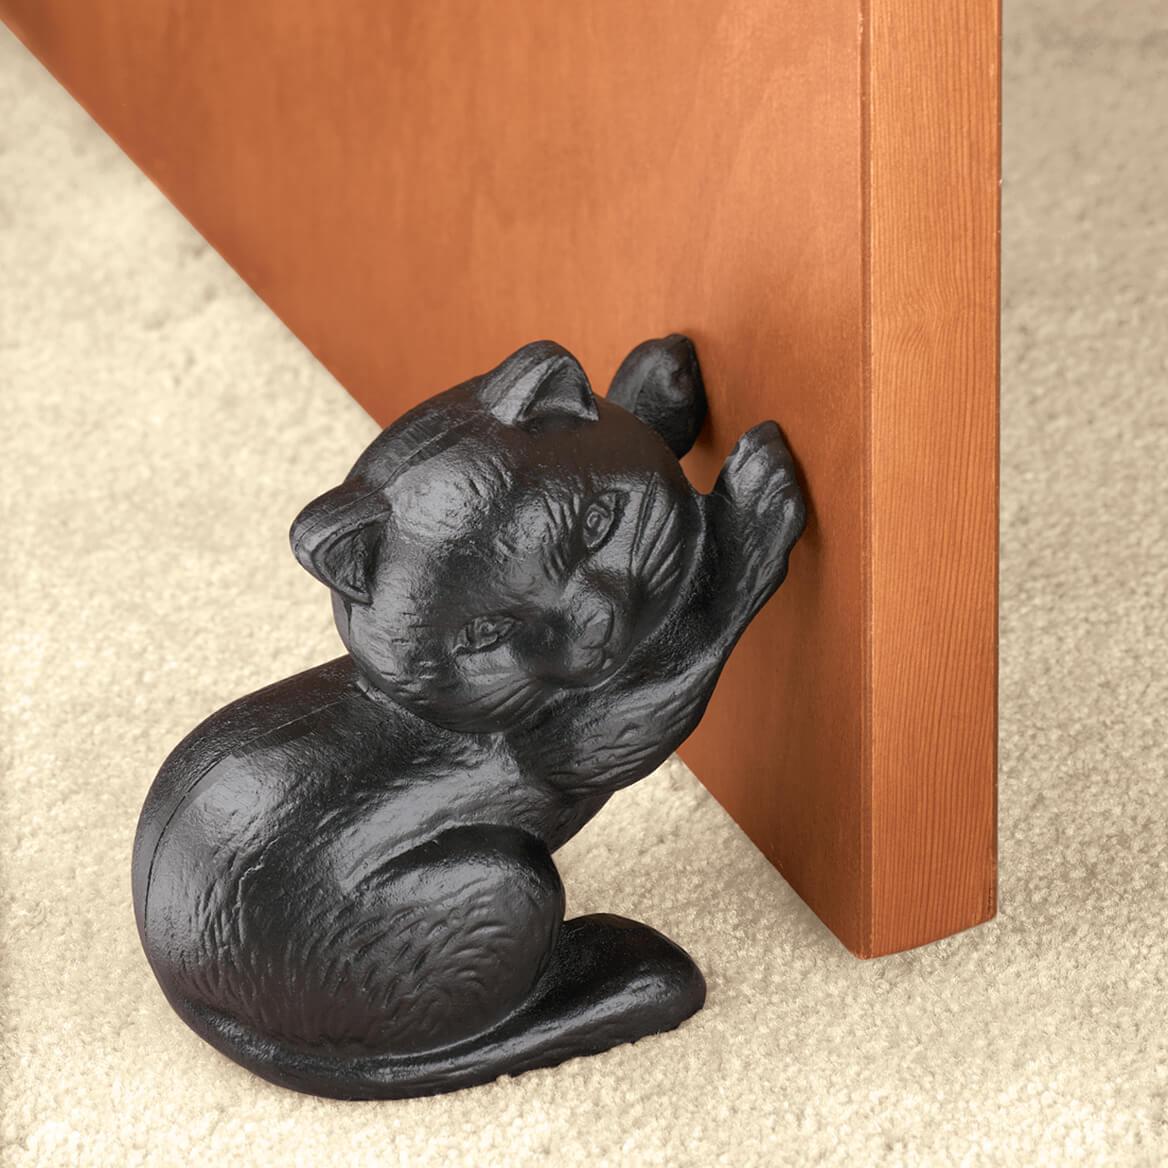 Incroyable Cast Iron Cat Doorstop